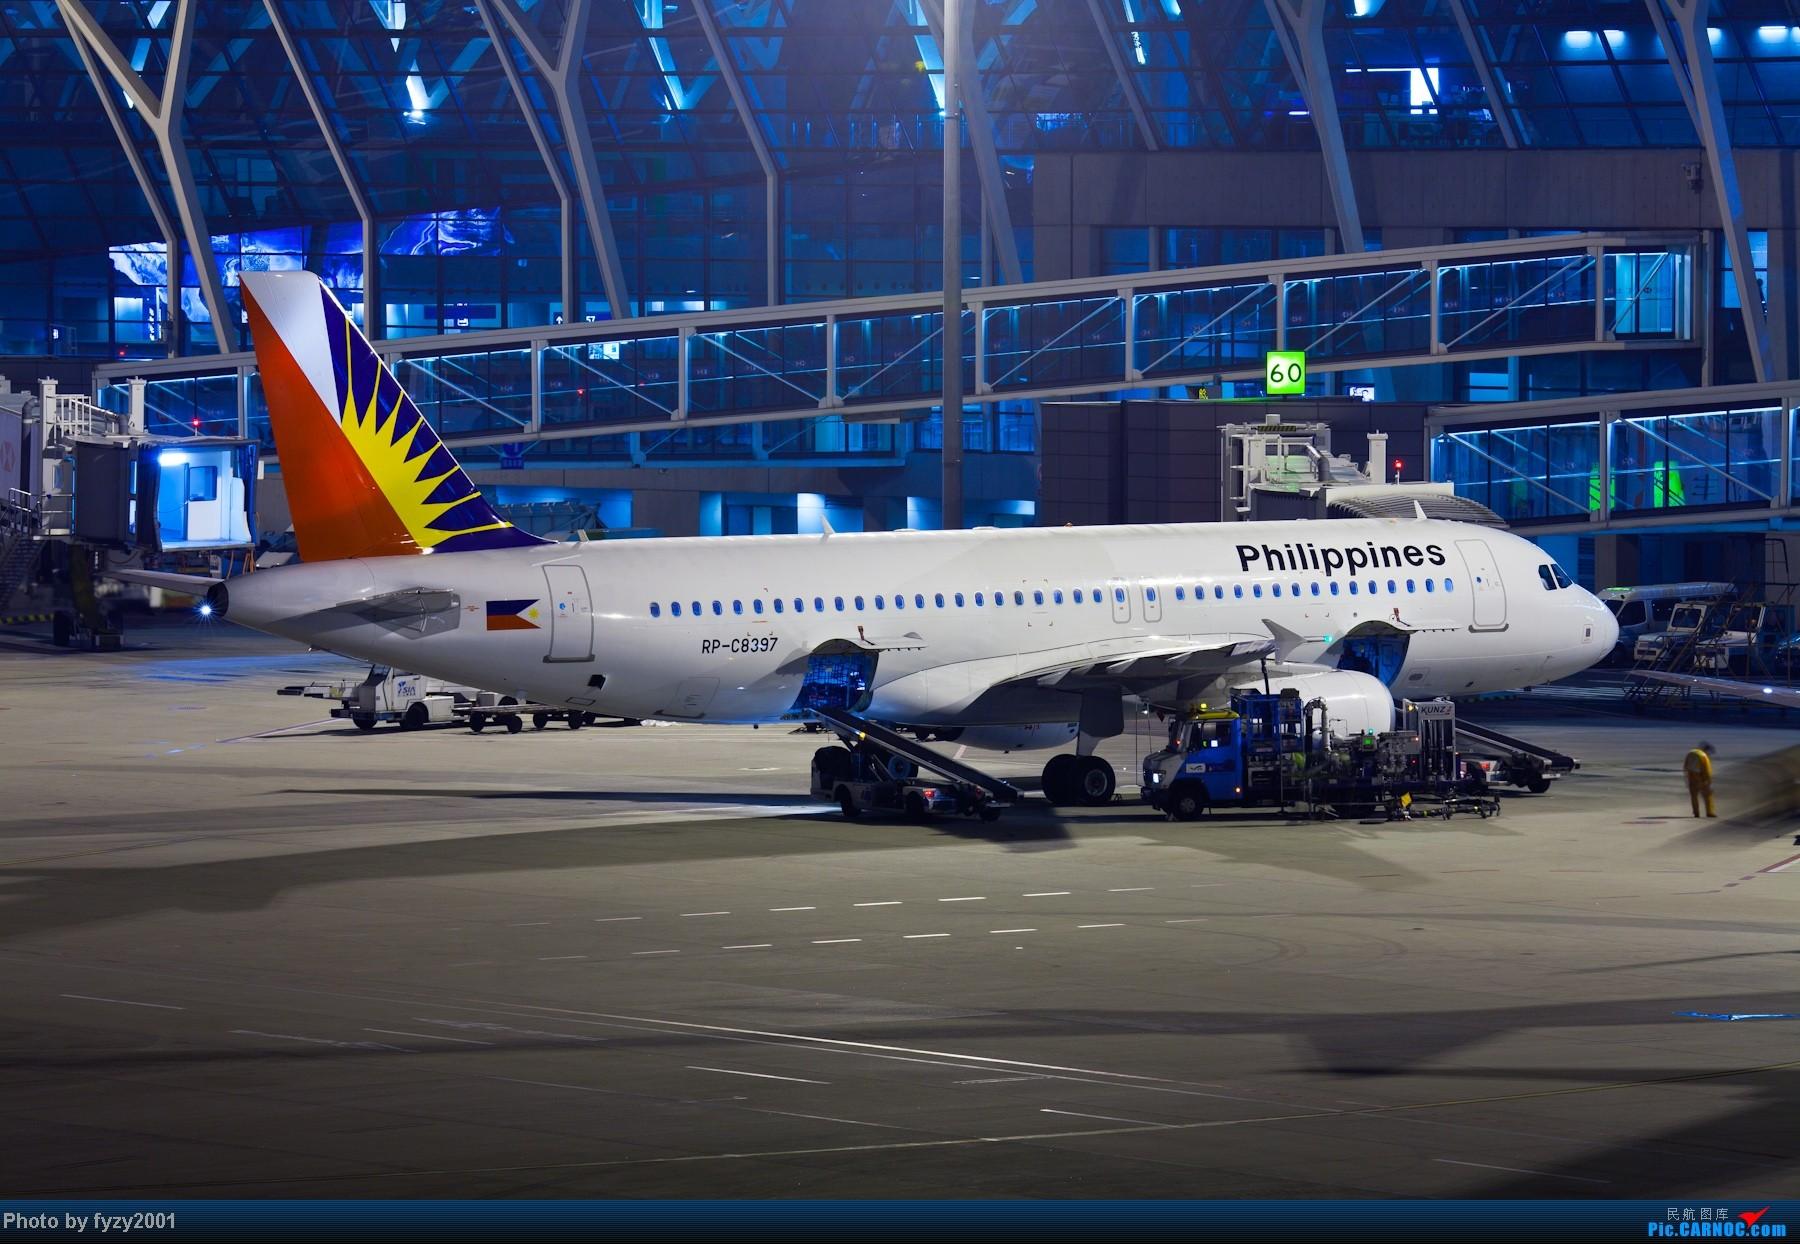 Re:[原创][无锡西站]3月RP爆表的拍摄-各种MD11~1800超大图 AIRBUS A320 RP-C3268 中国上海浦东机场